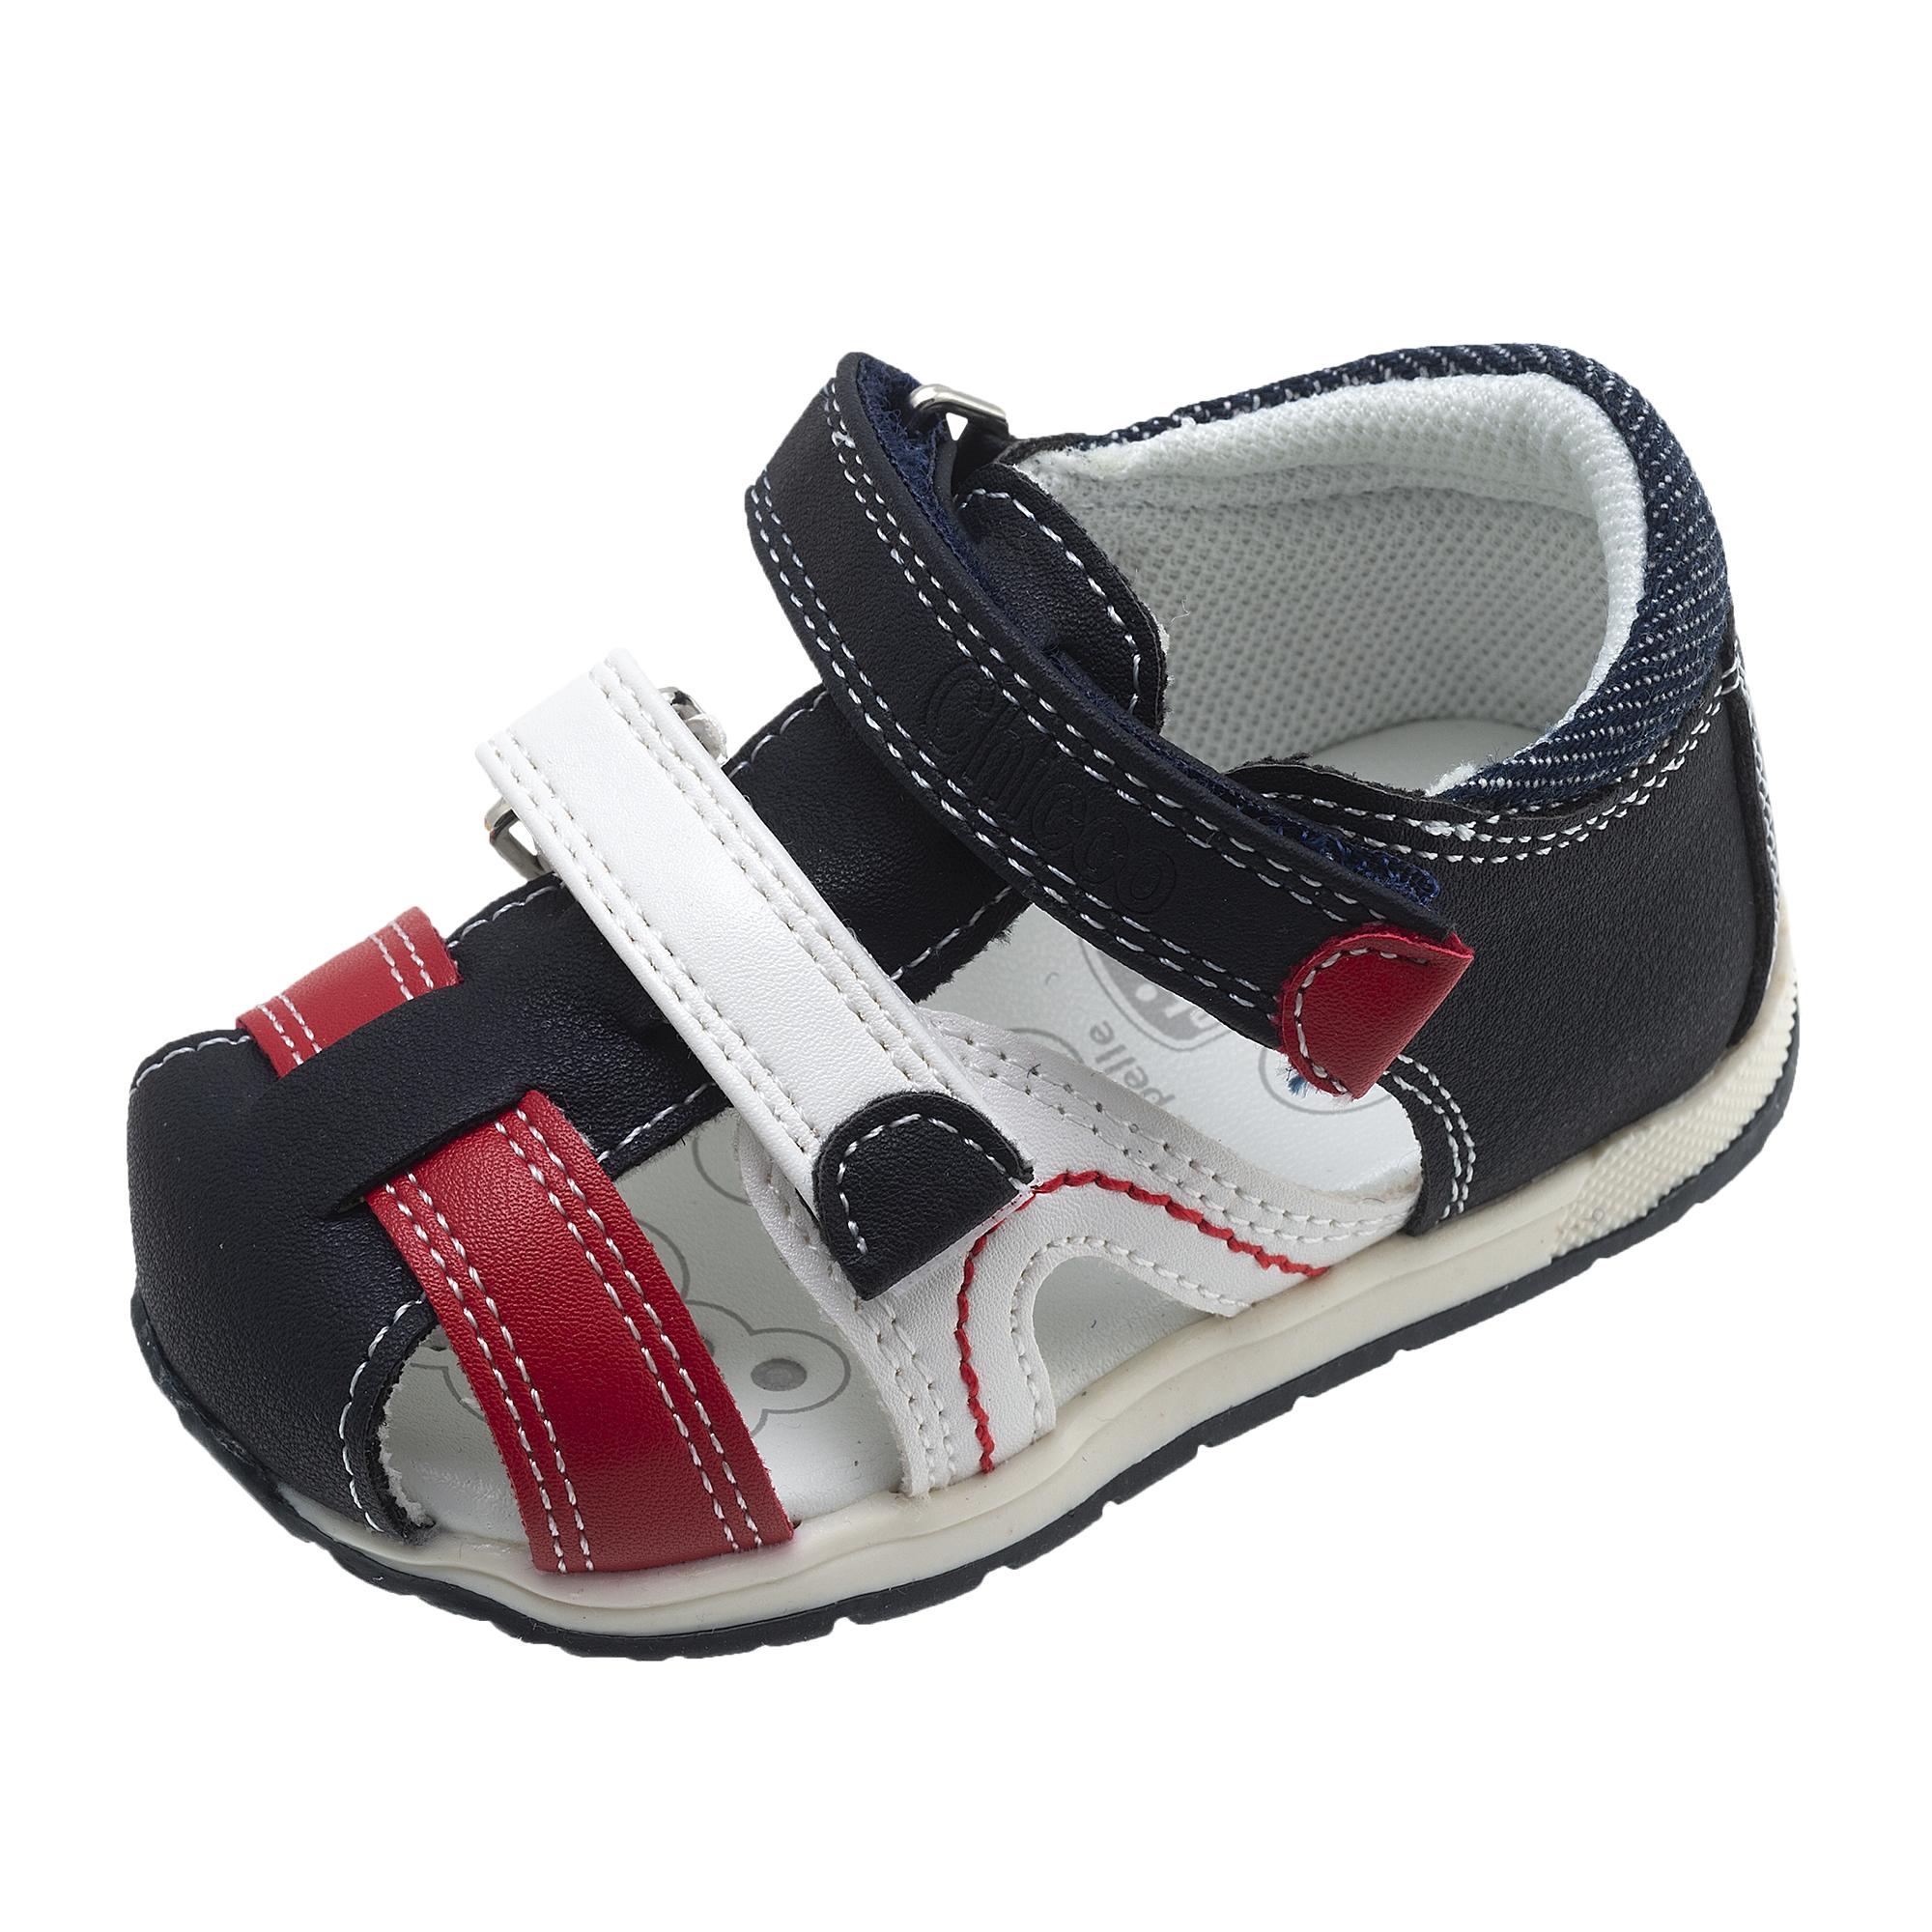 Sandale Copii Chicco Gabriel, Bleumarin, 61523 imagine